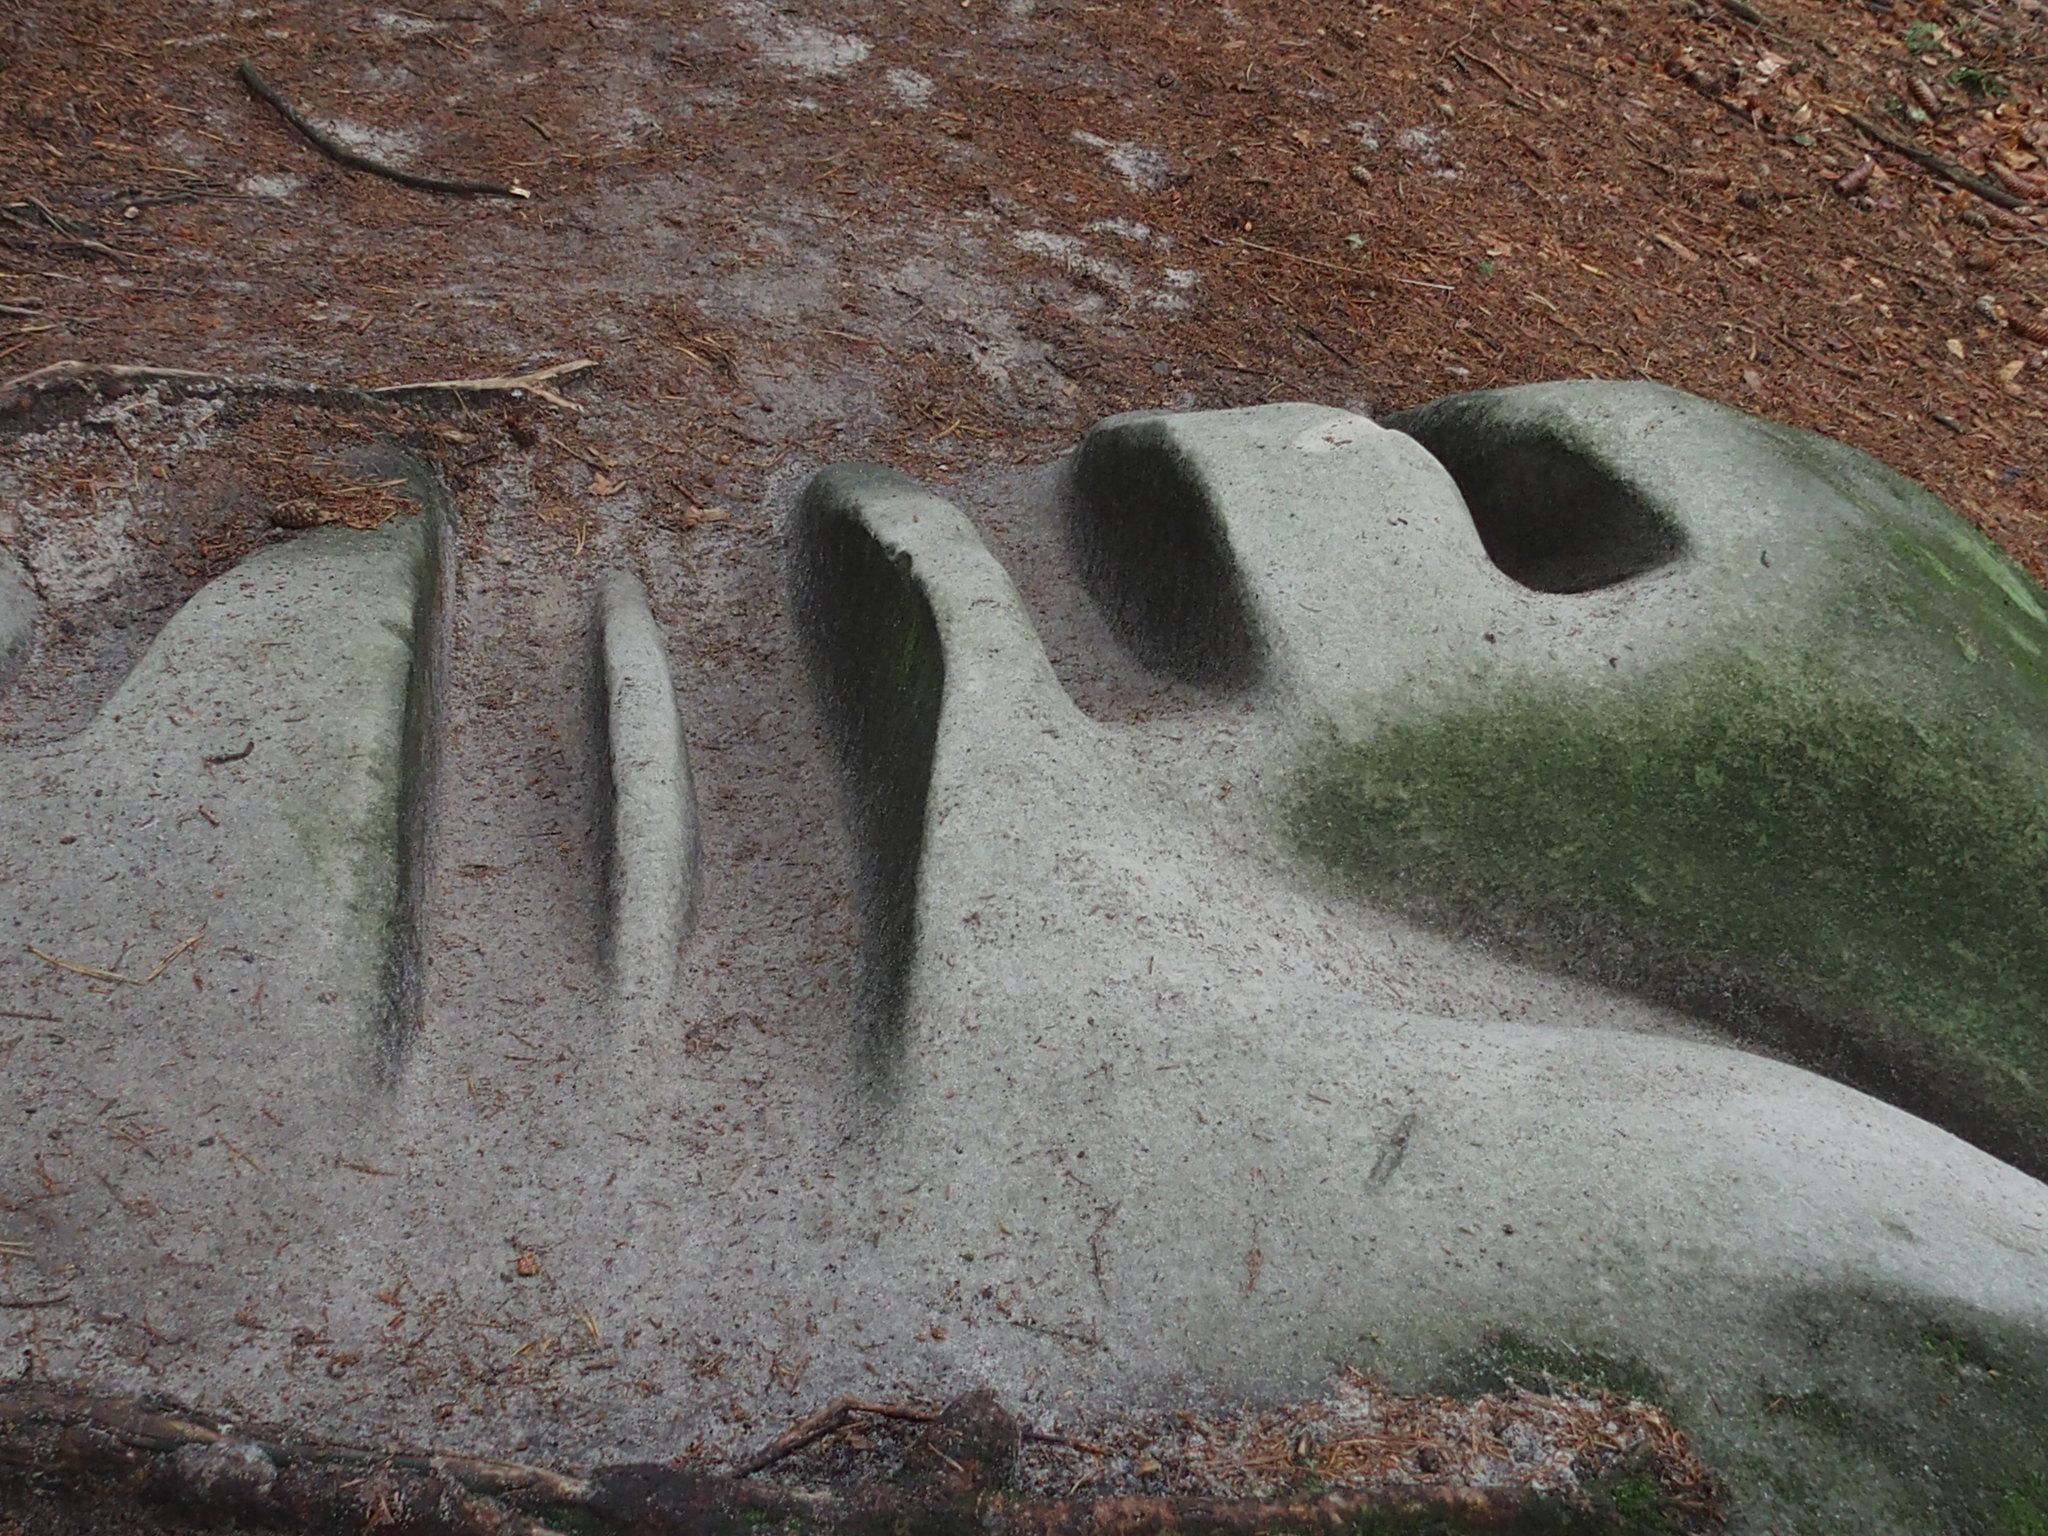 Naturlig erosion?